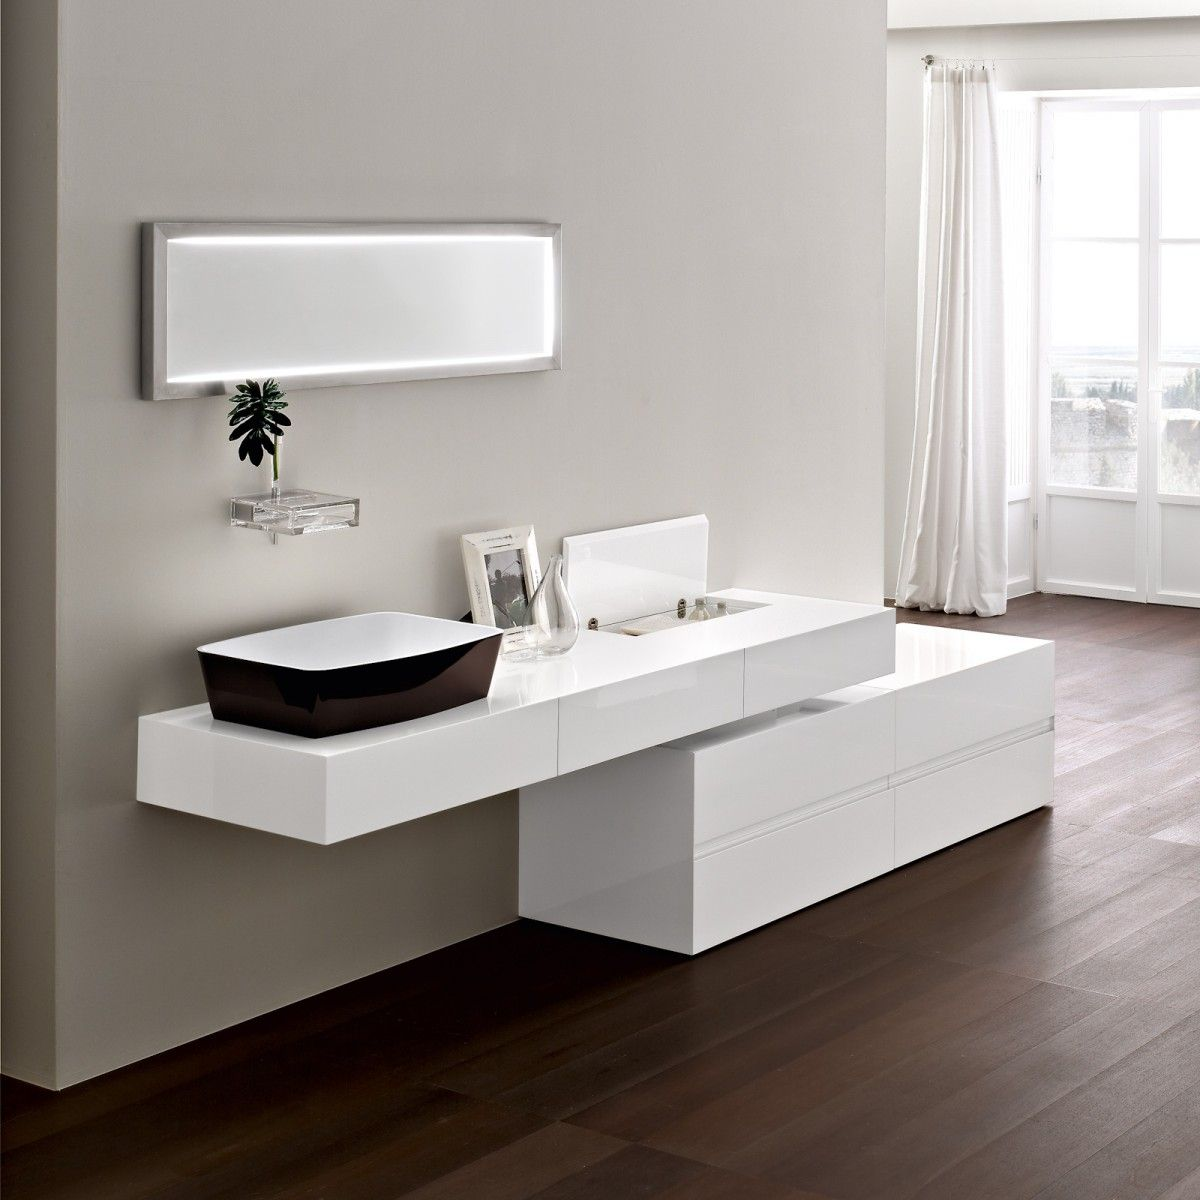 Ultra Modern Italian Bathroom Design Bathroom Vanity Units Vanity - Ultra modern bathroom vanities